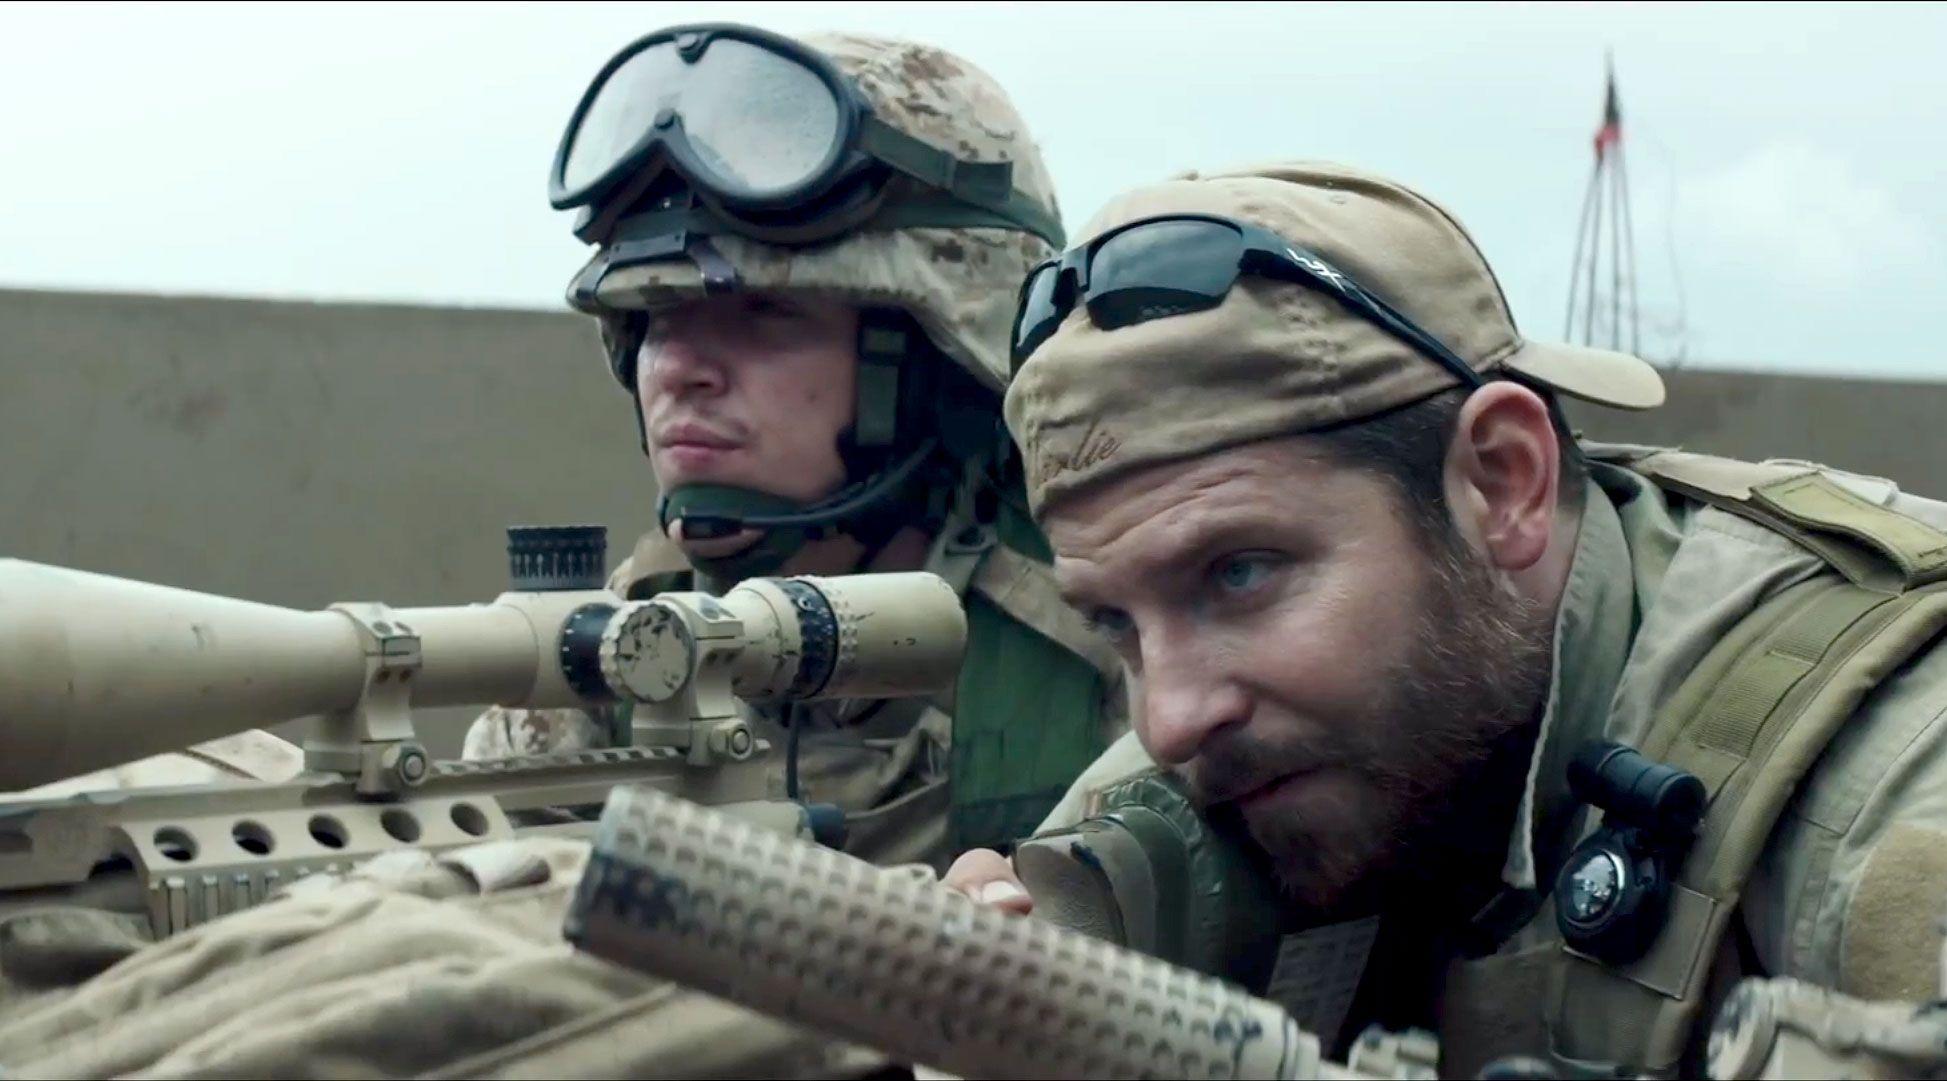 10. American Sniper